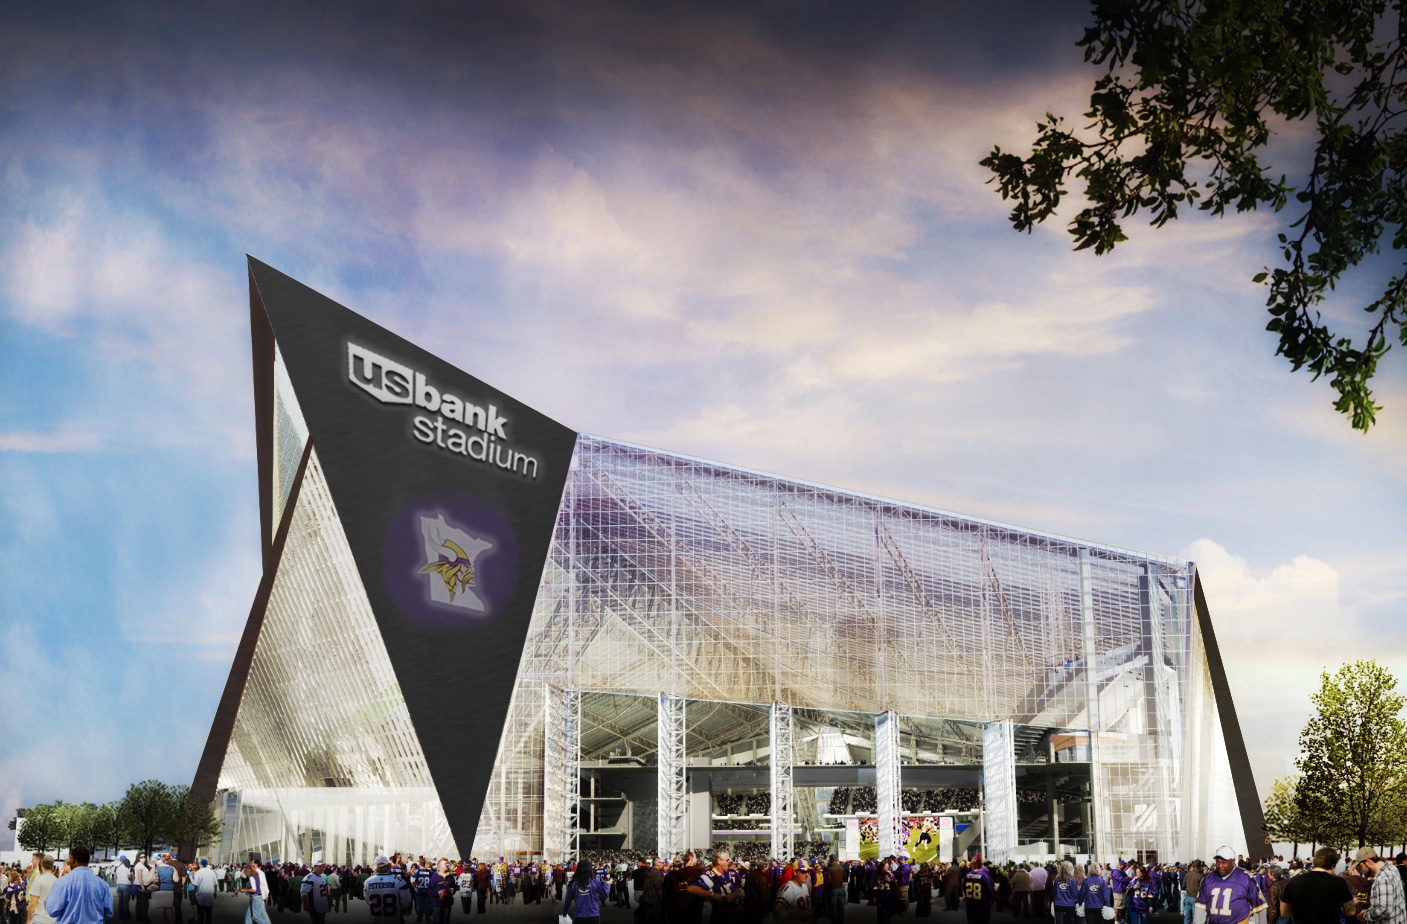 Sustainability drove design behind us bank stadium green - Green design ...